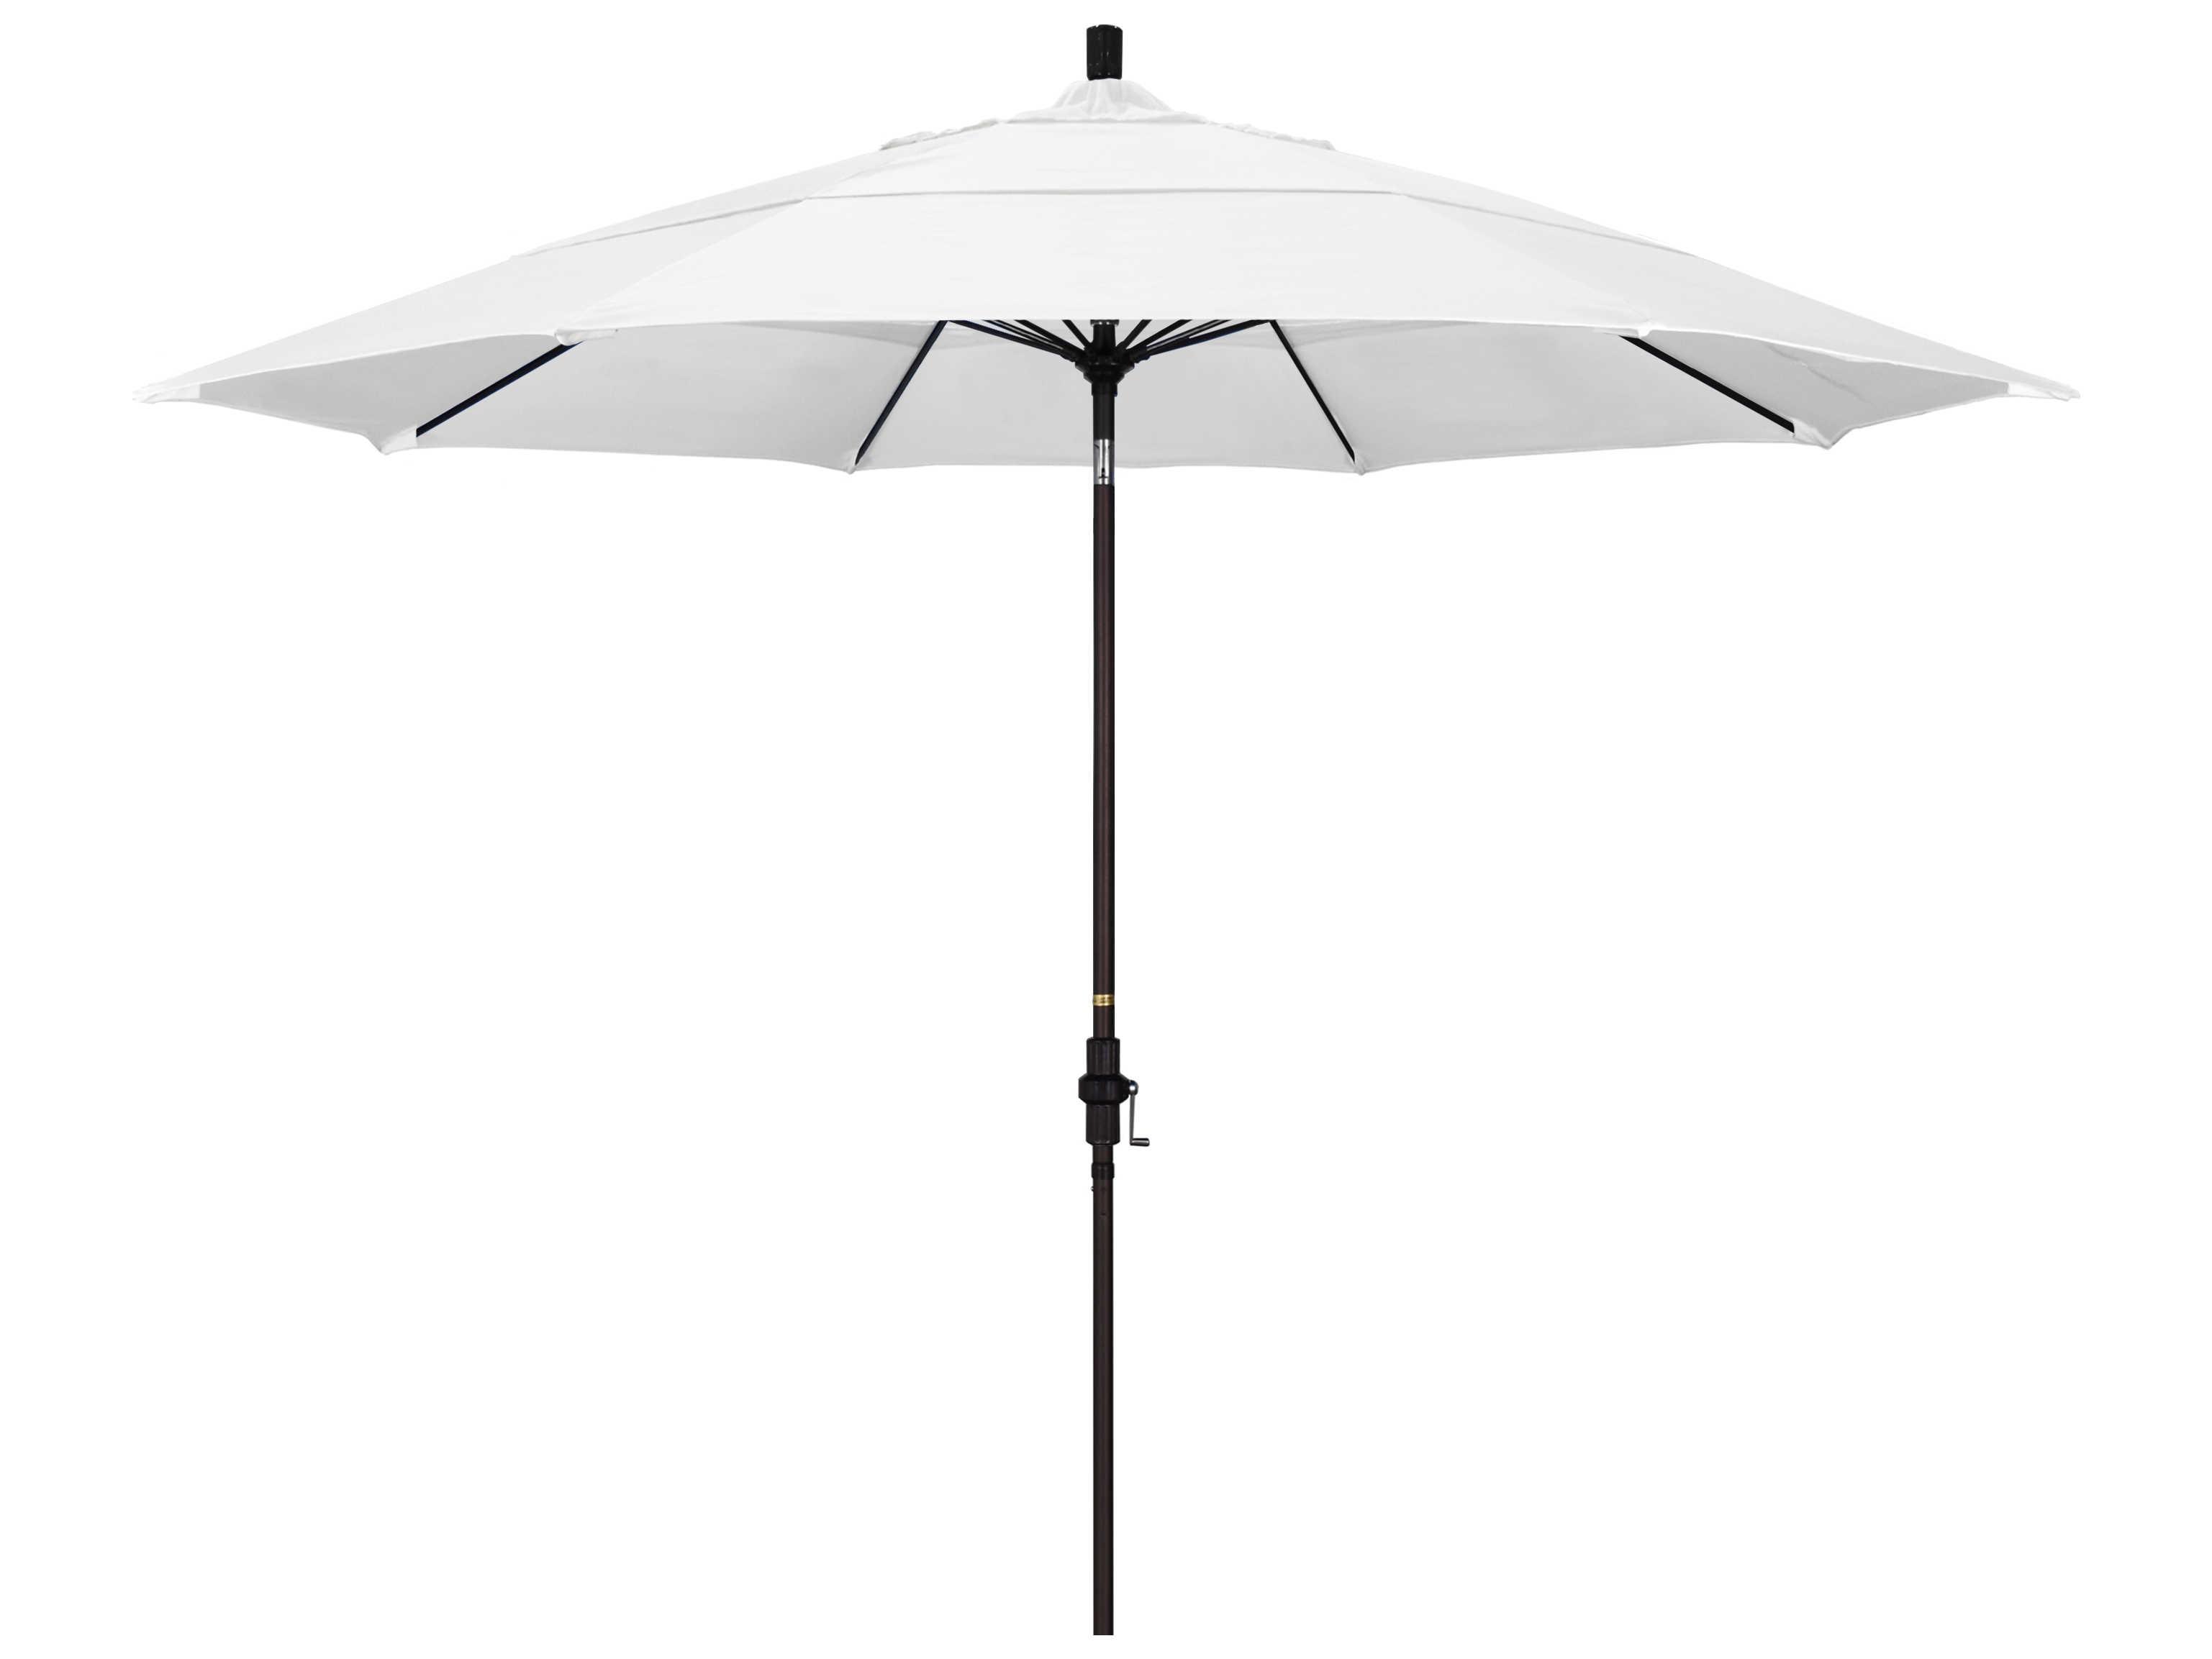 California Umbrella Sun Master Series 11 Foot Octagon